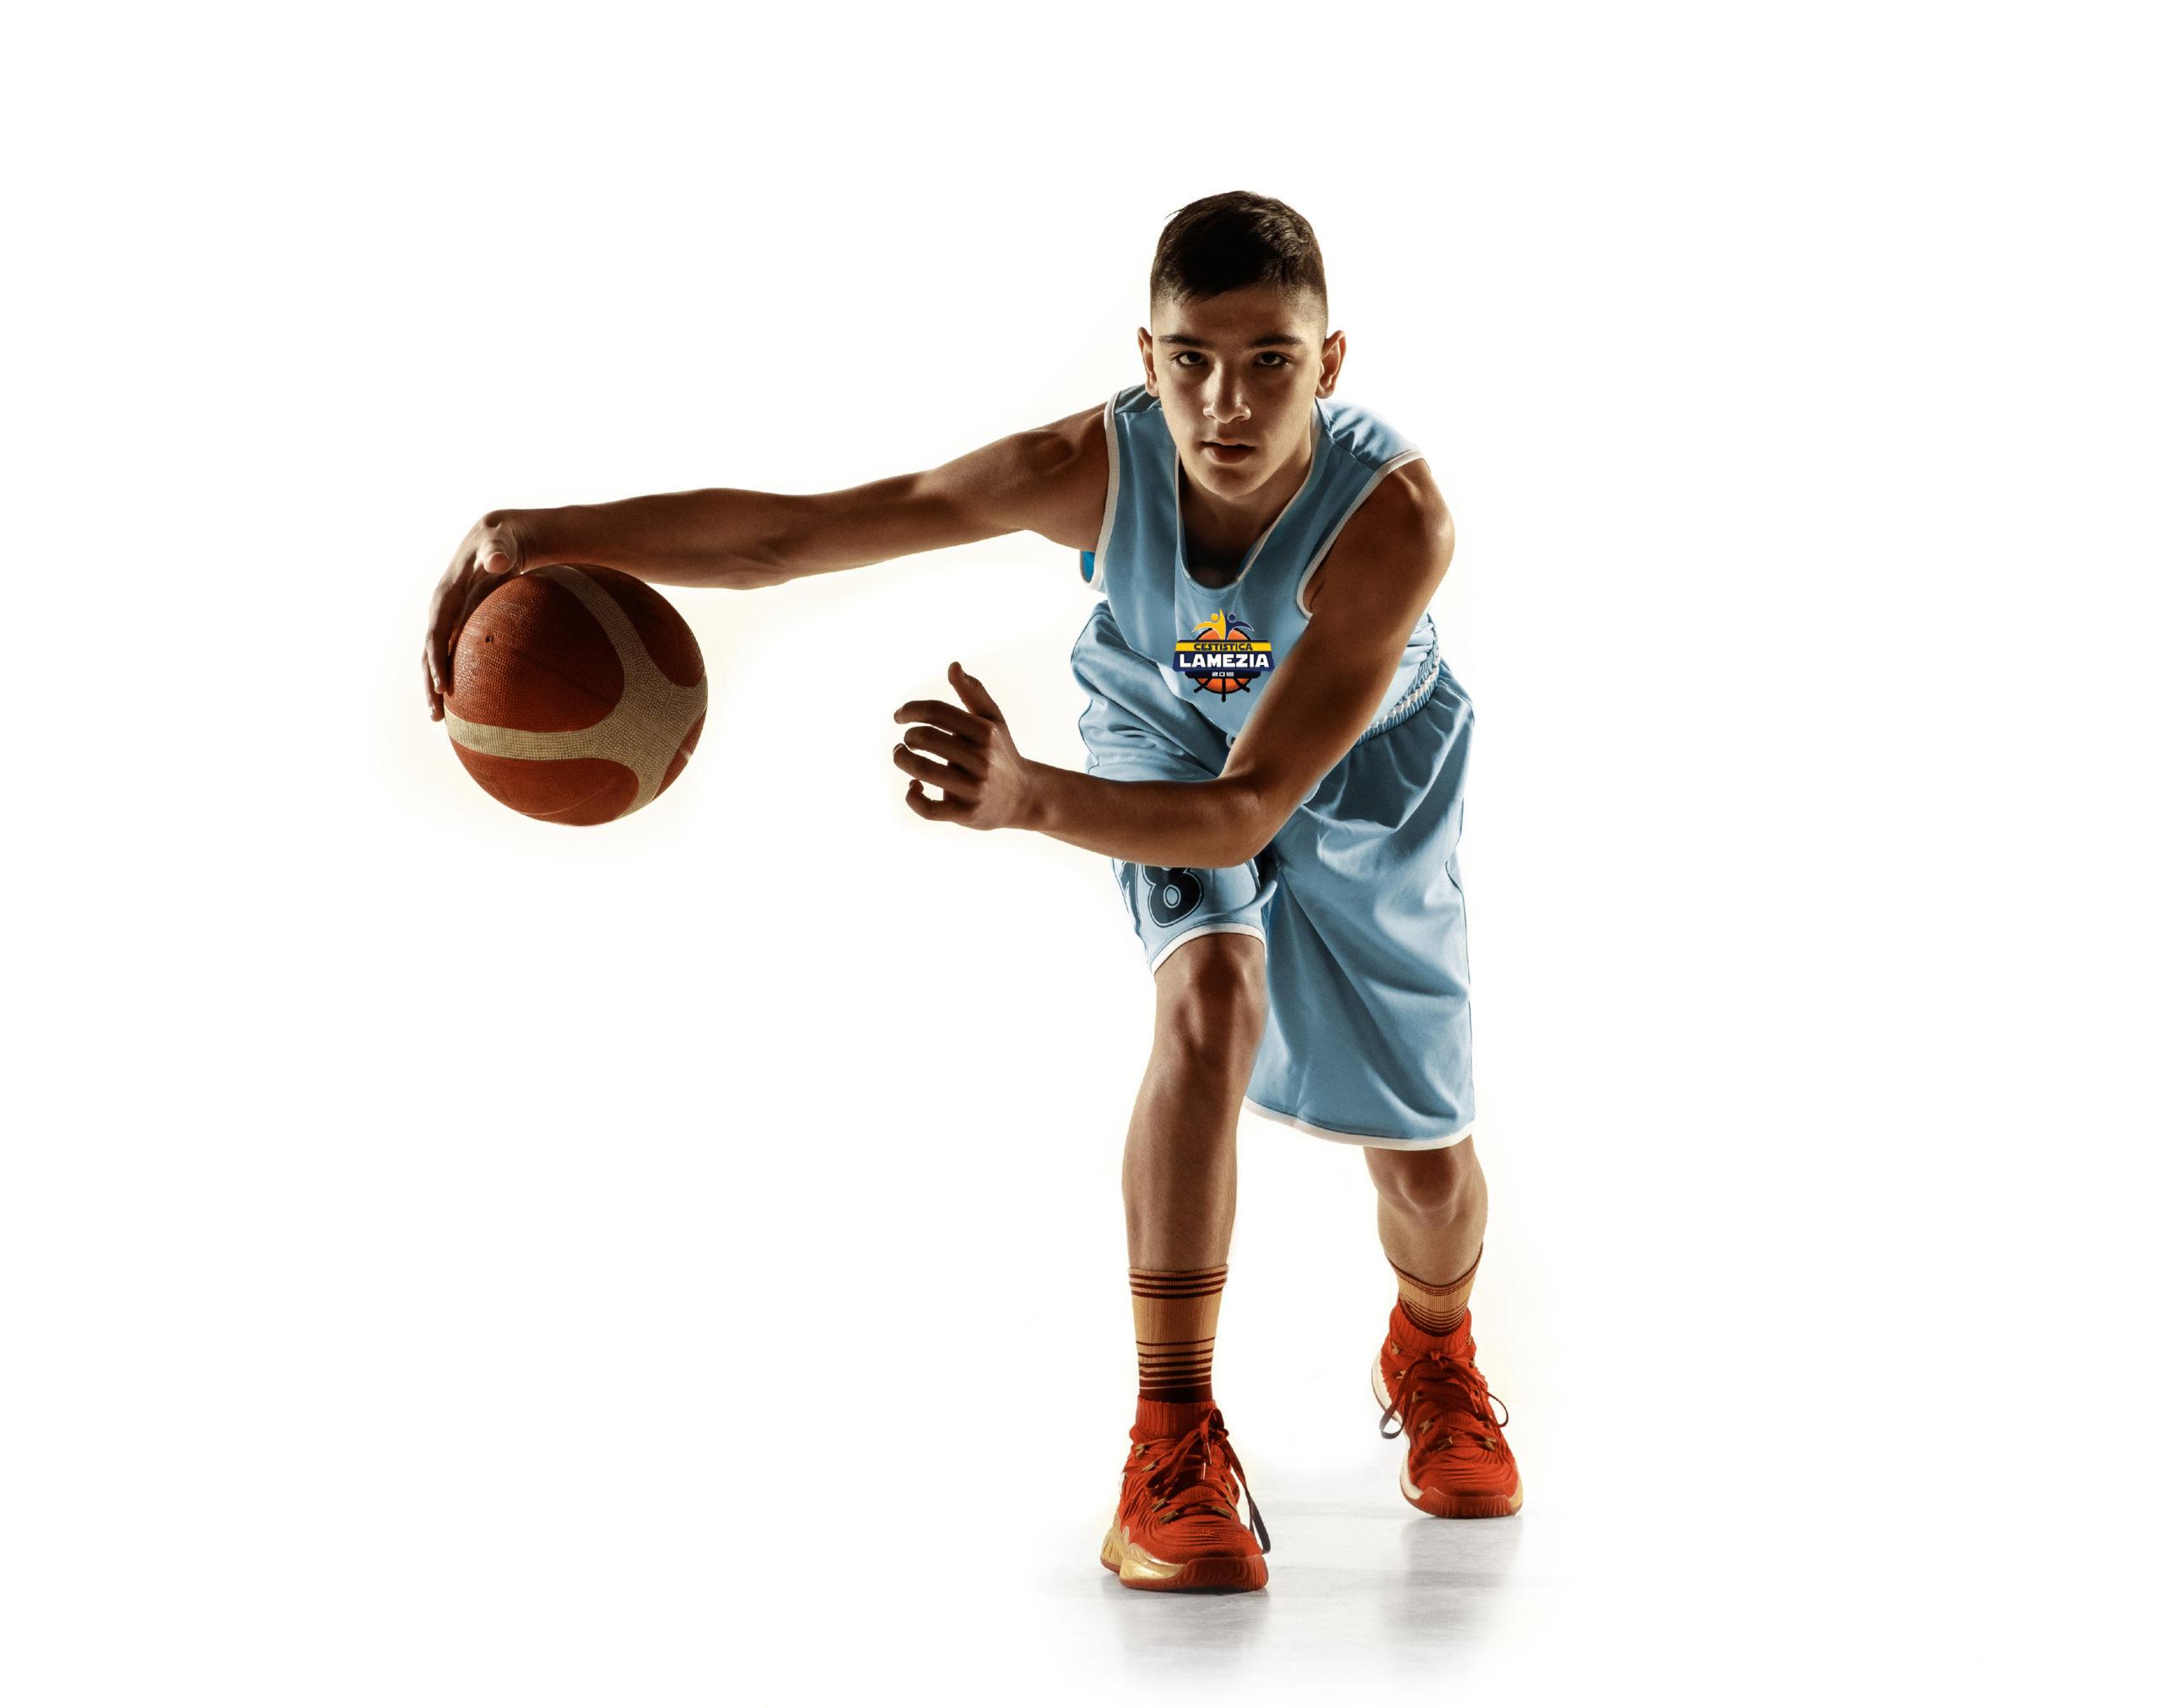 https://www.cestisticalamezia2018.it/wp-content/uploads/2021/09/basket-playerTavola-disegno-1-1-scaled.jpg